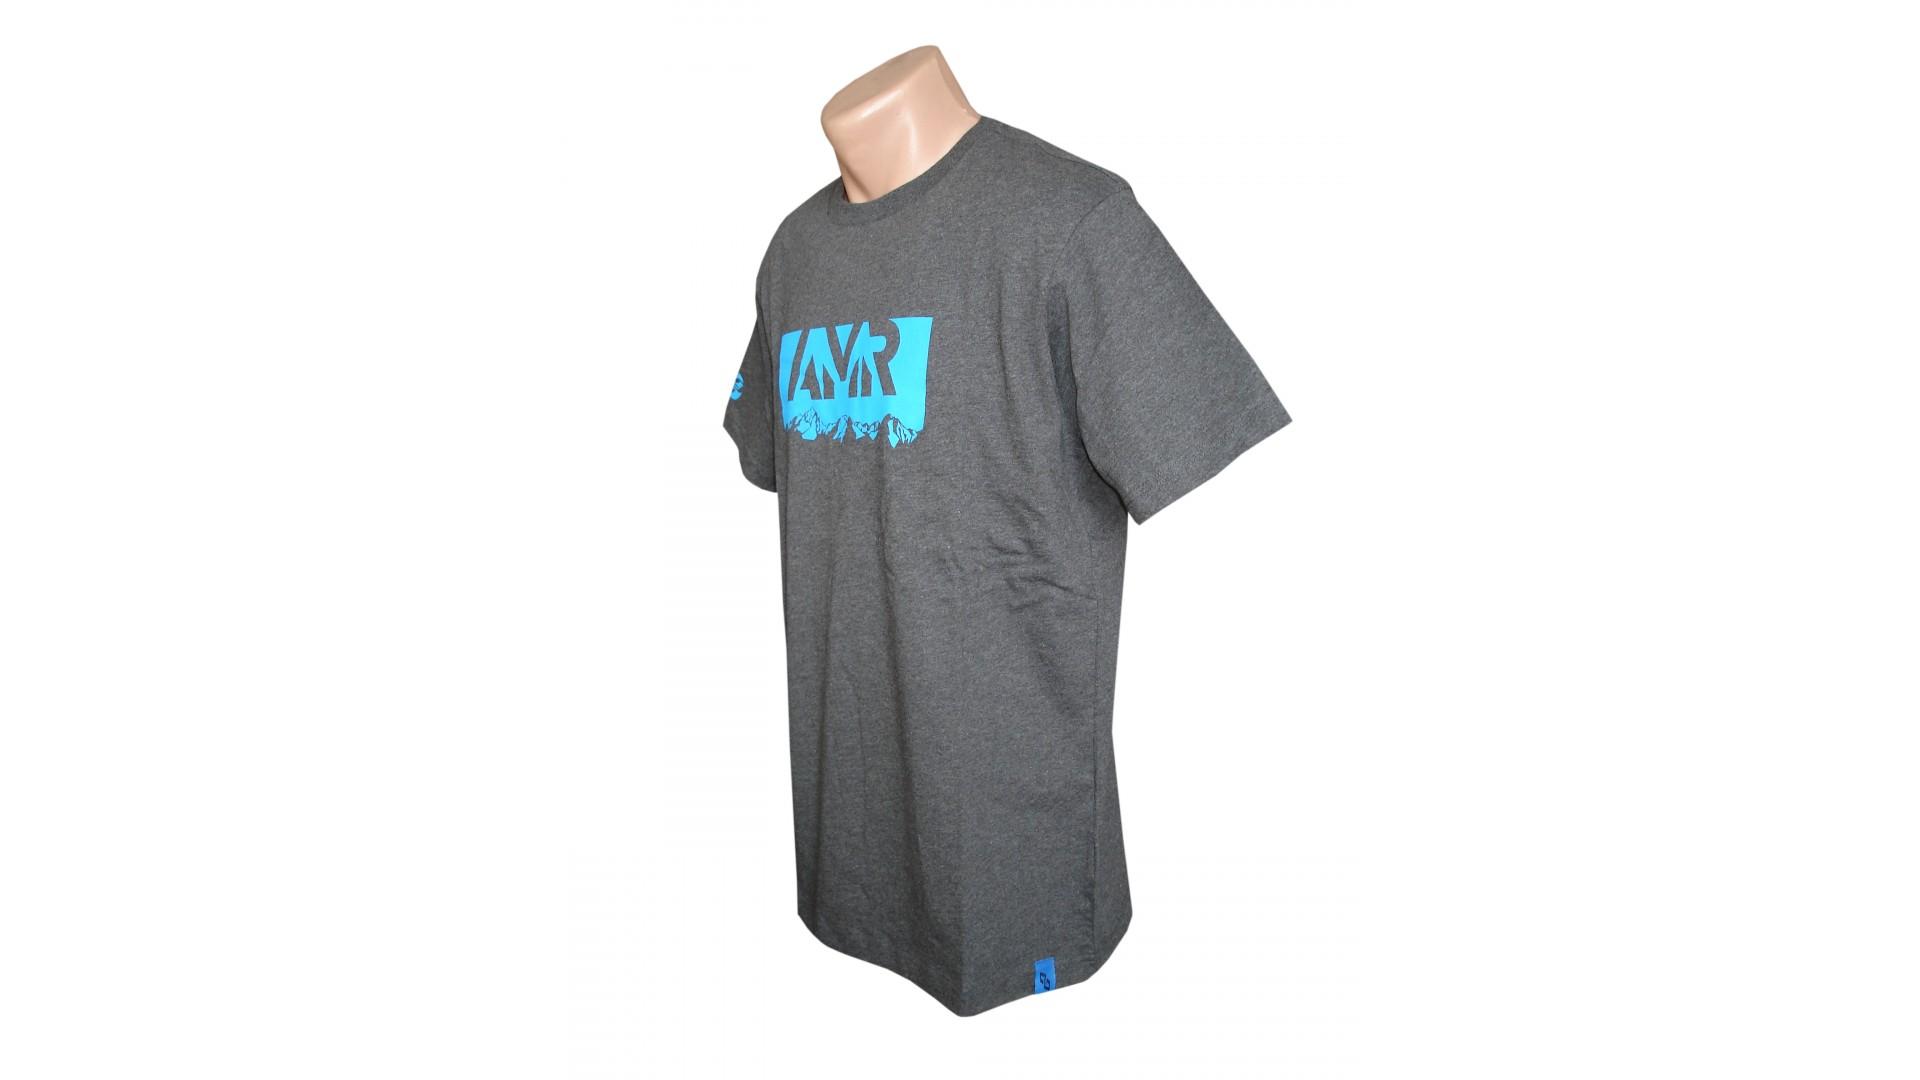 Футболка Ghost T-shirt AMR grey год 2016 вид сбоку